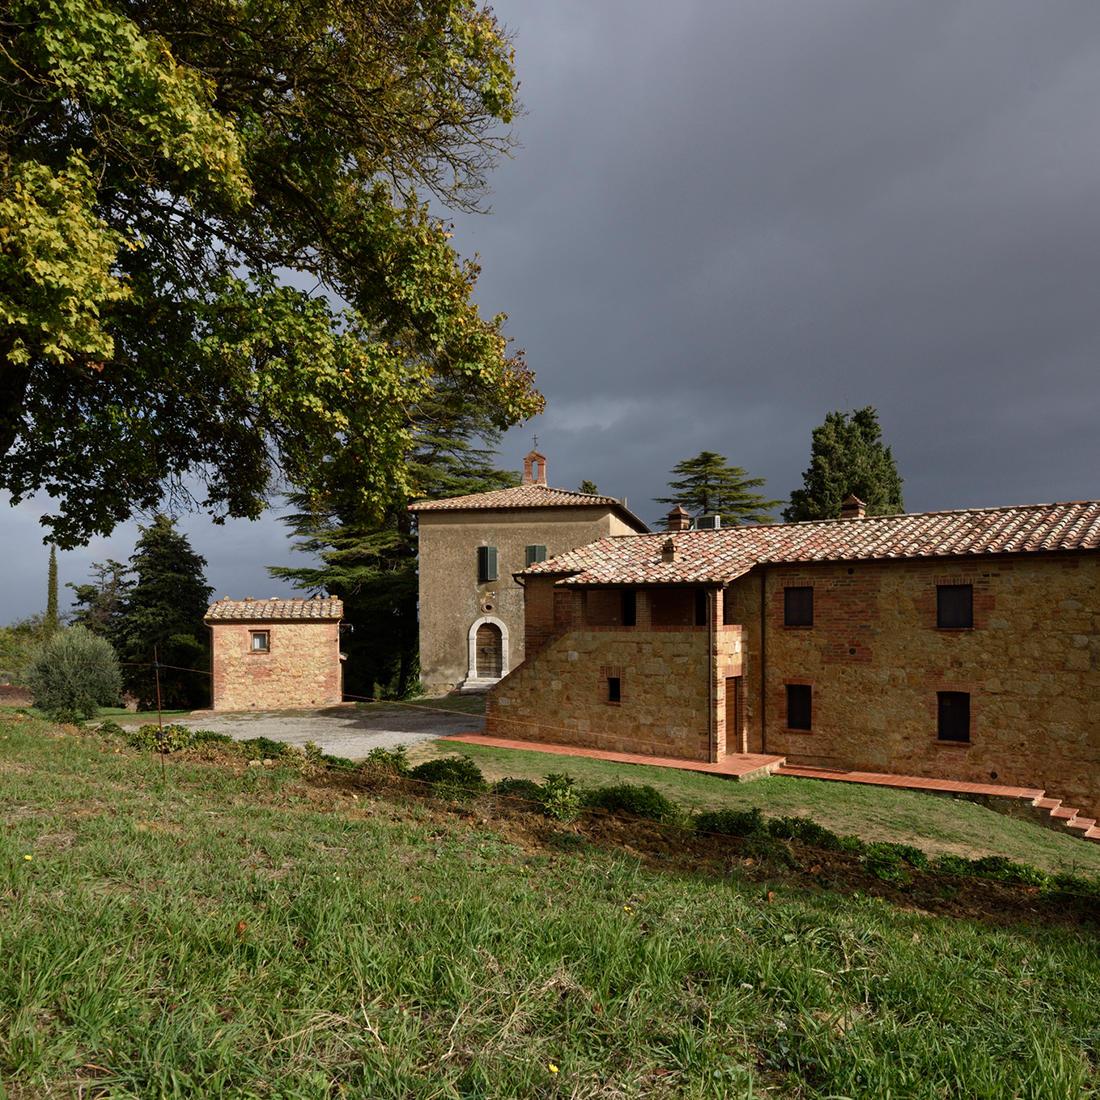 Exterior Fontelellera   Relais Villa Grazianella